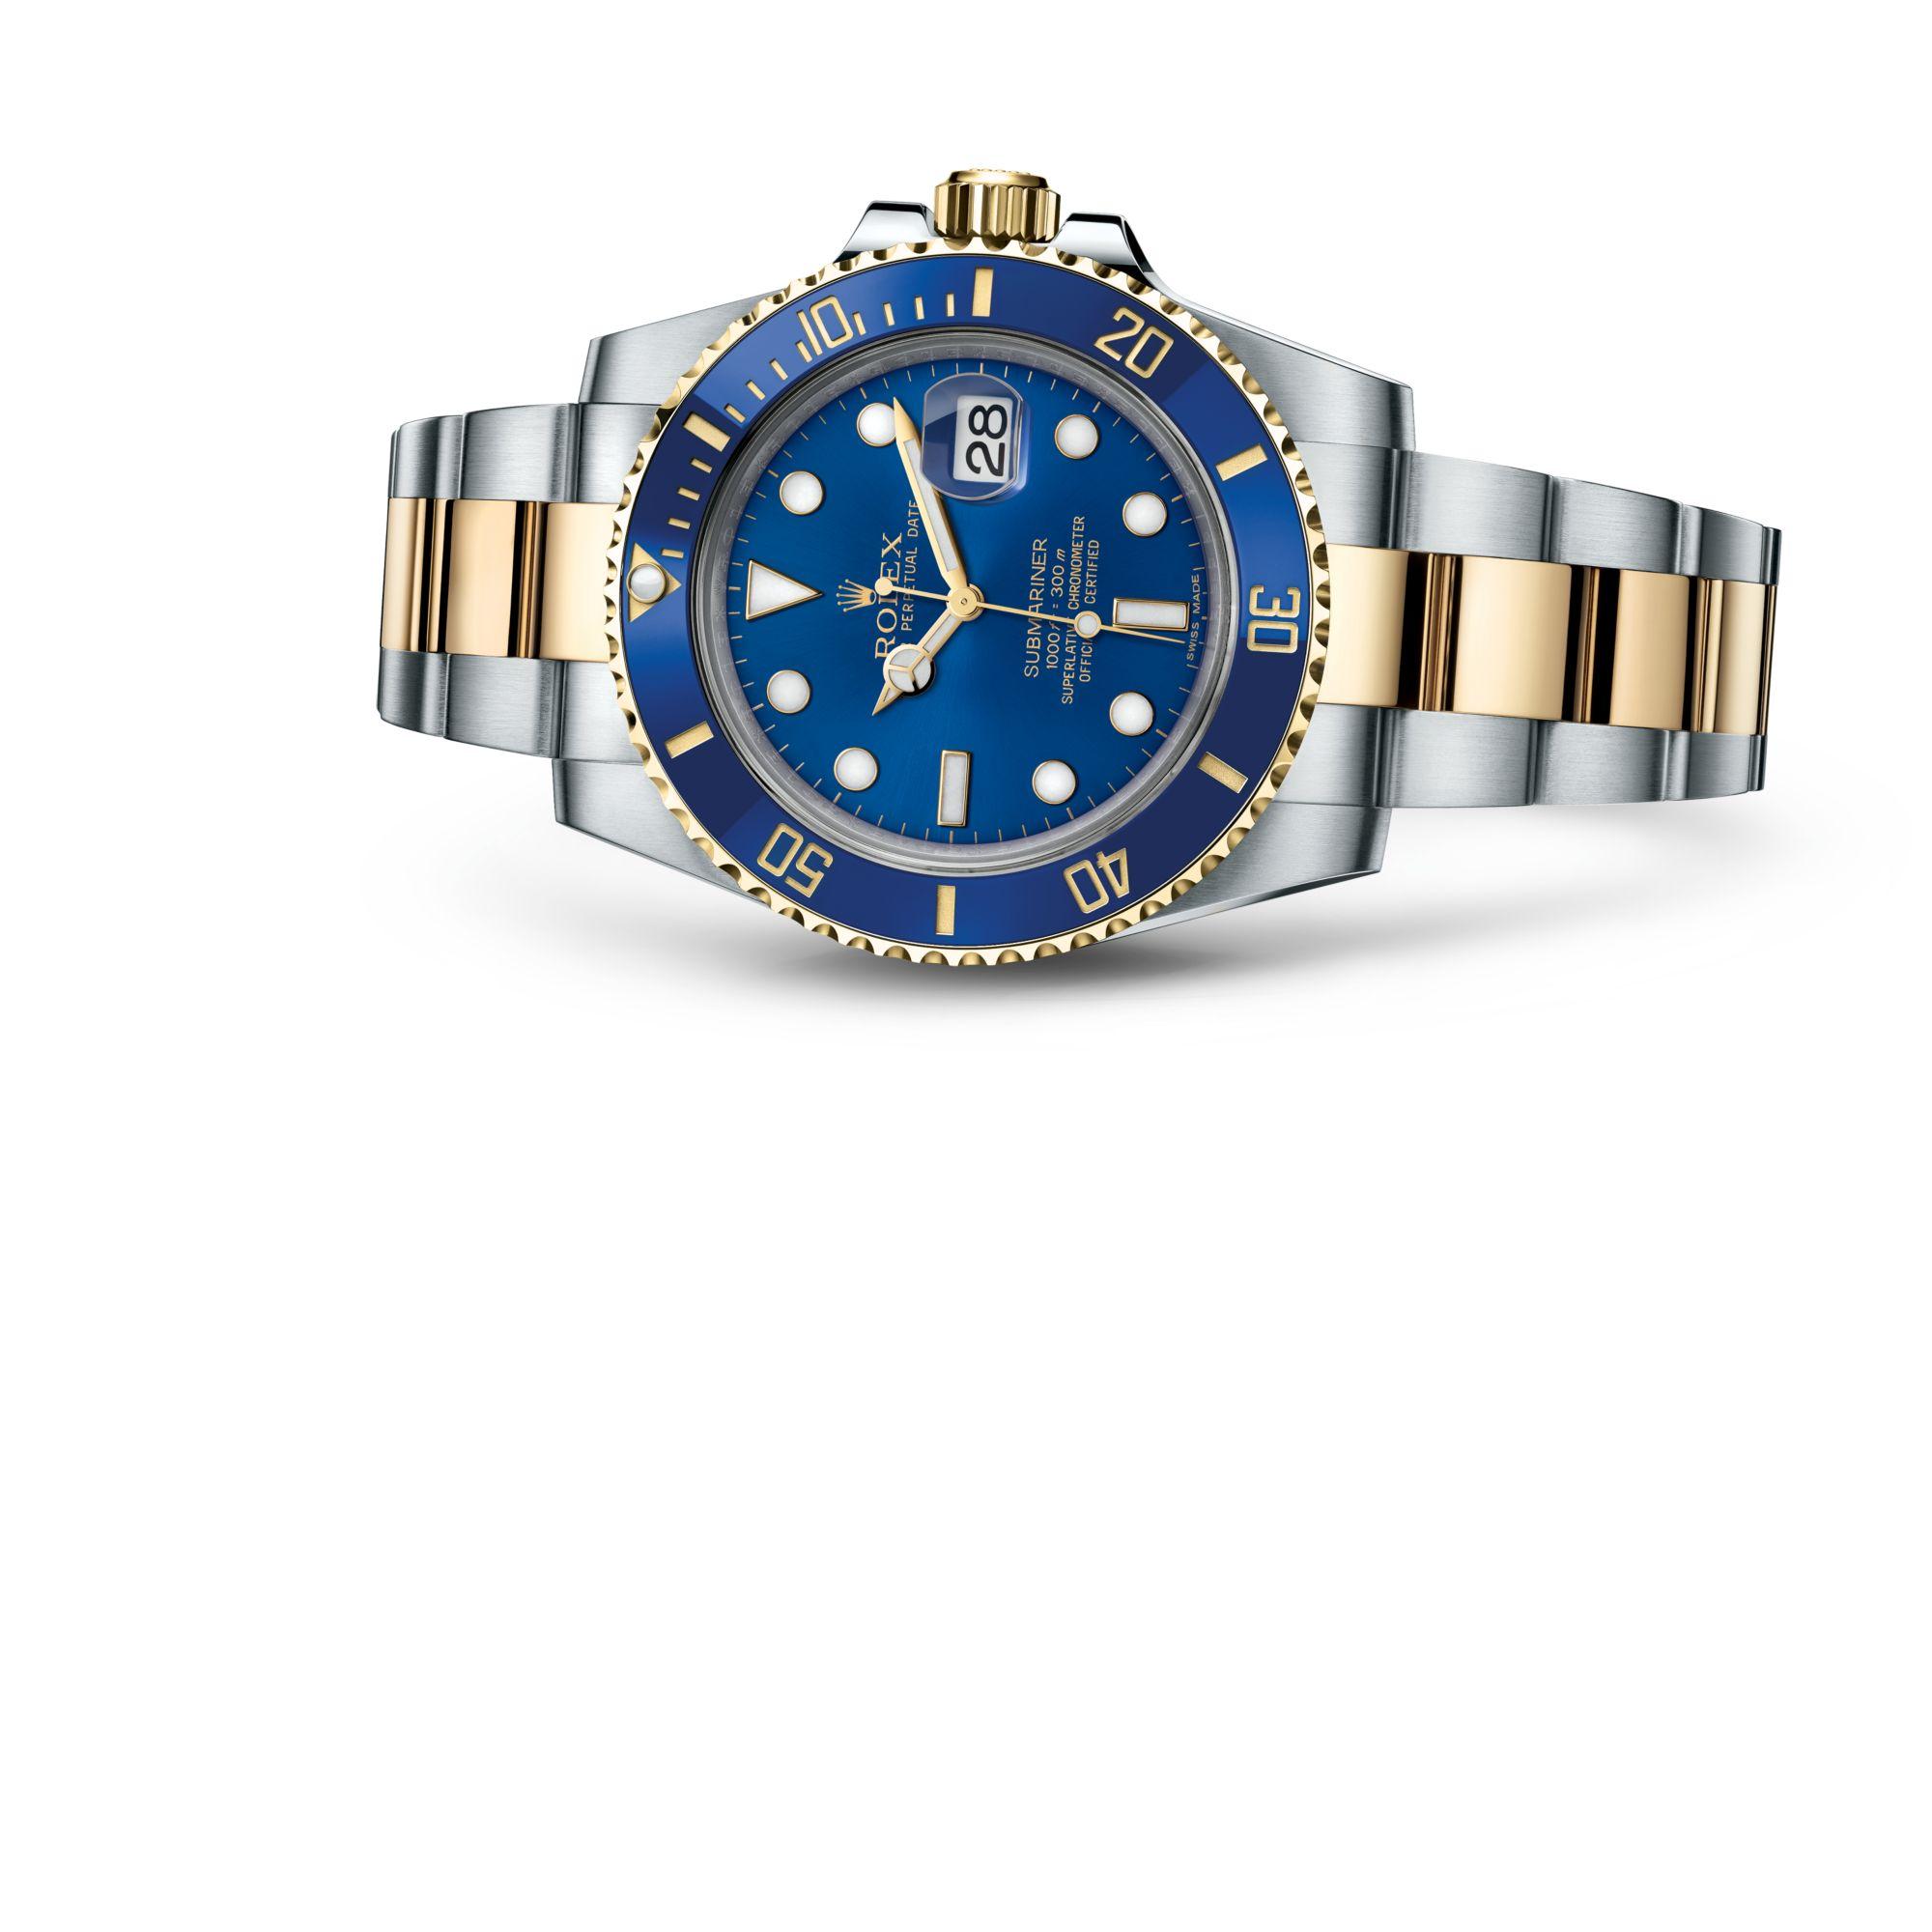 "Rolex <span lang=""en"">Submariner Date</span> M116613LB-0005"